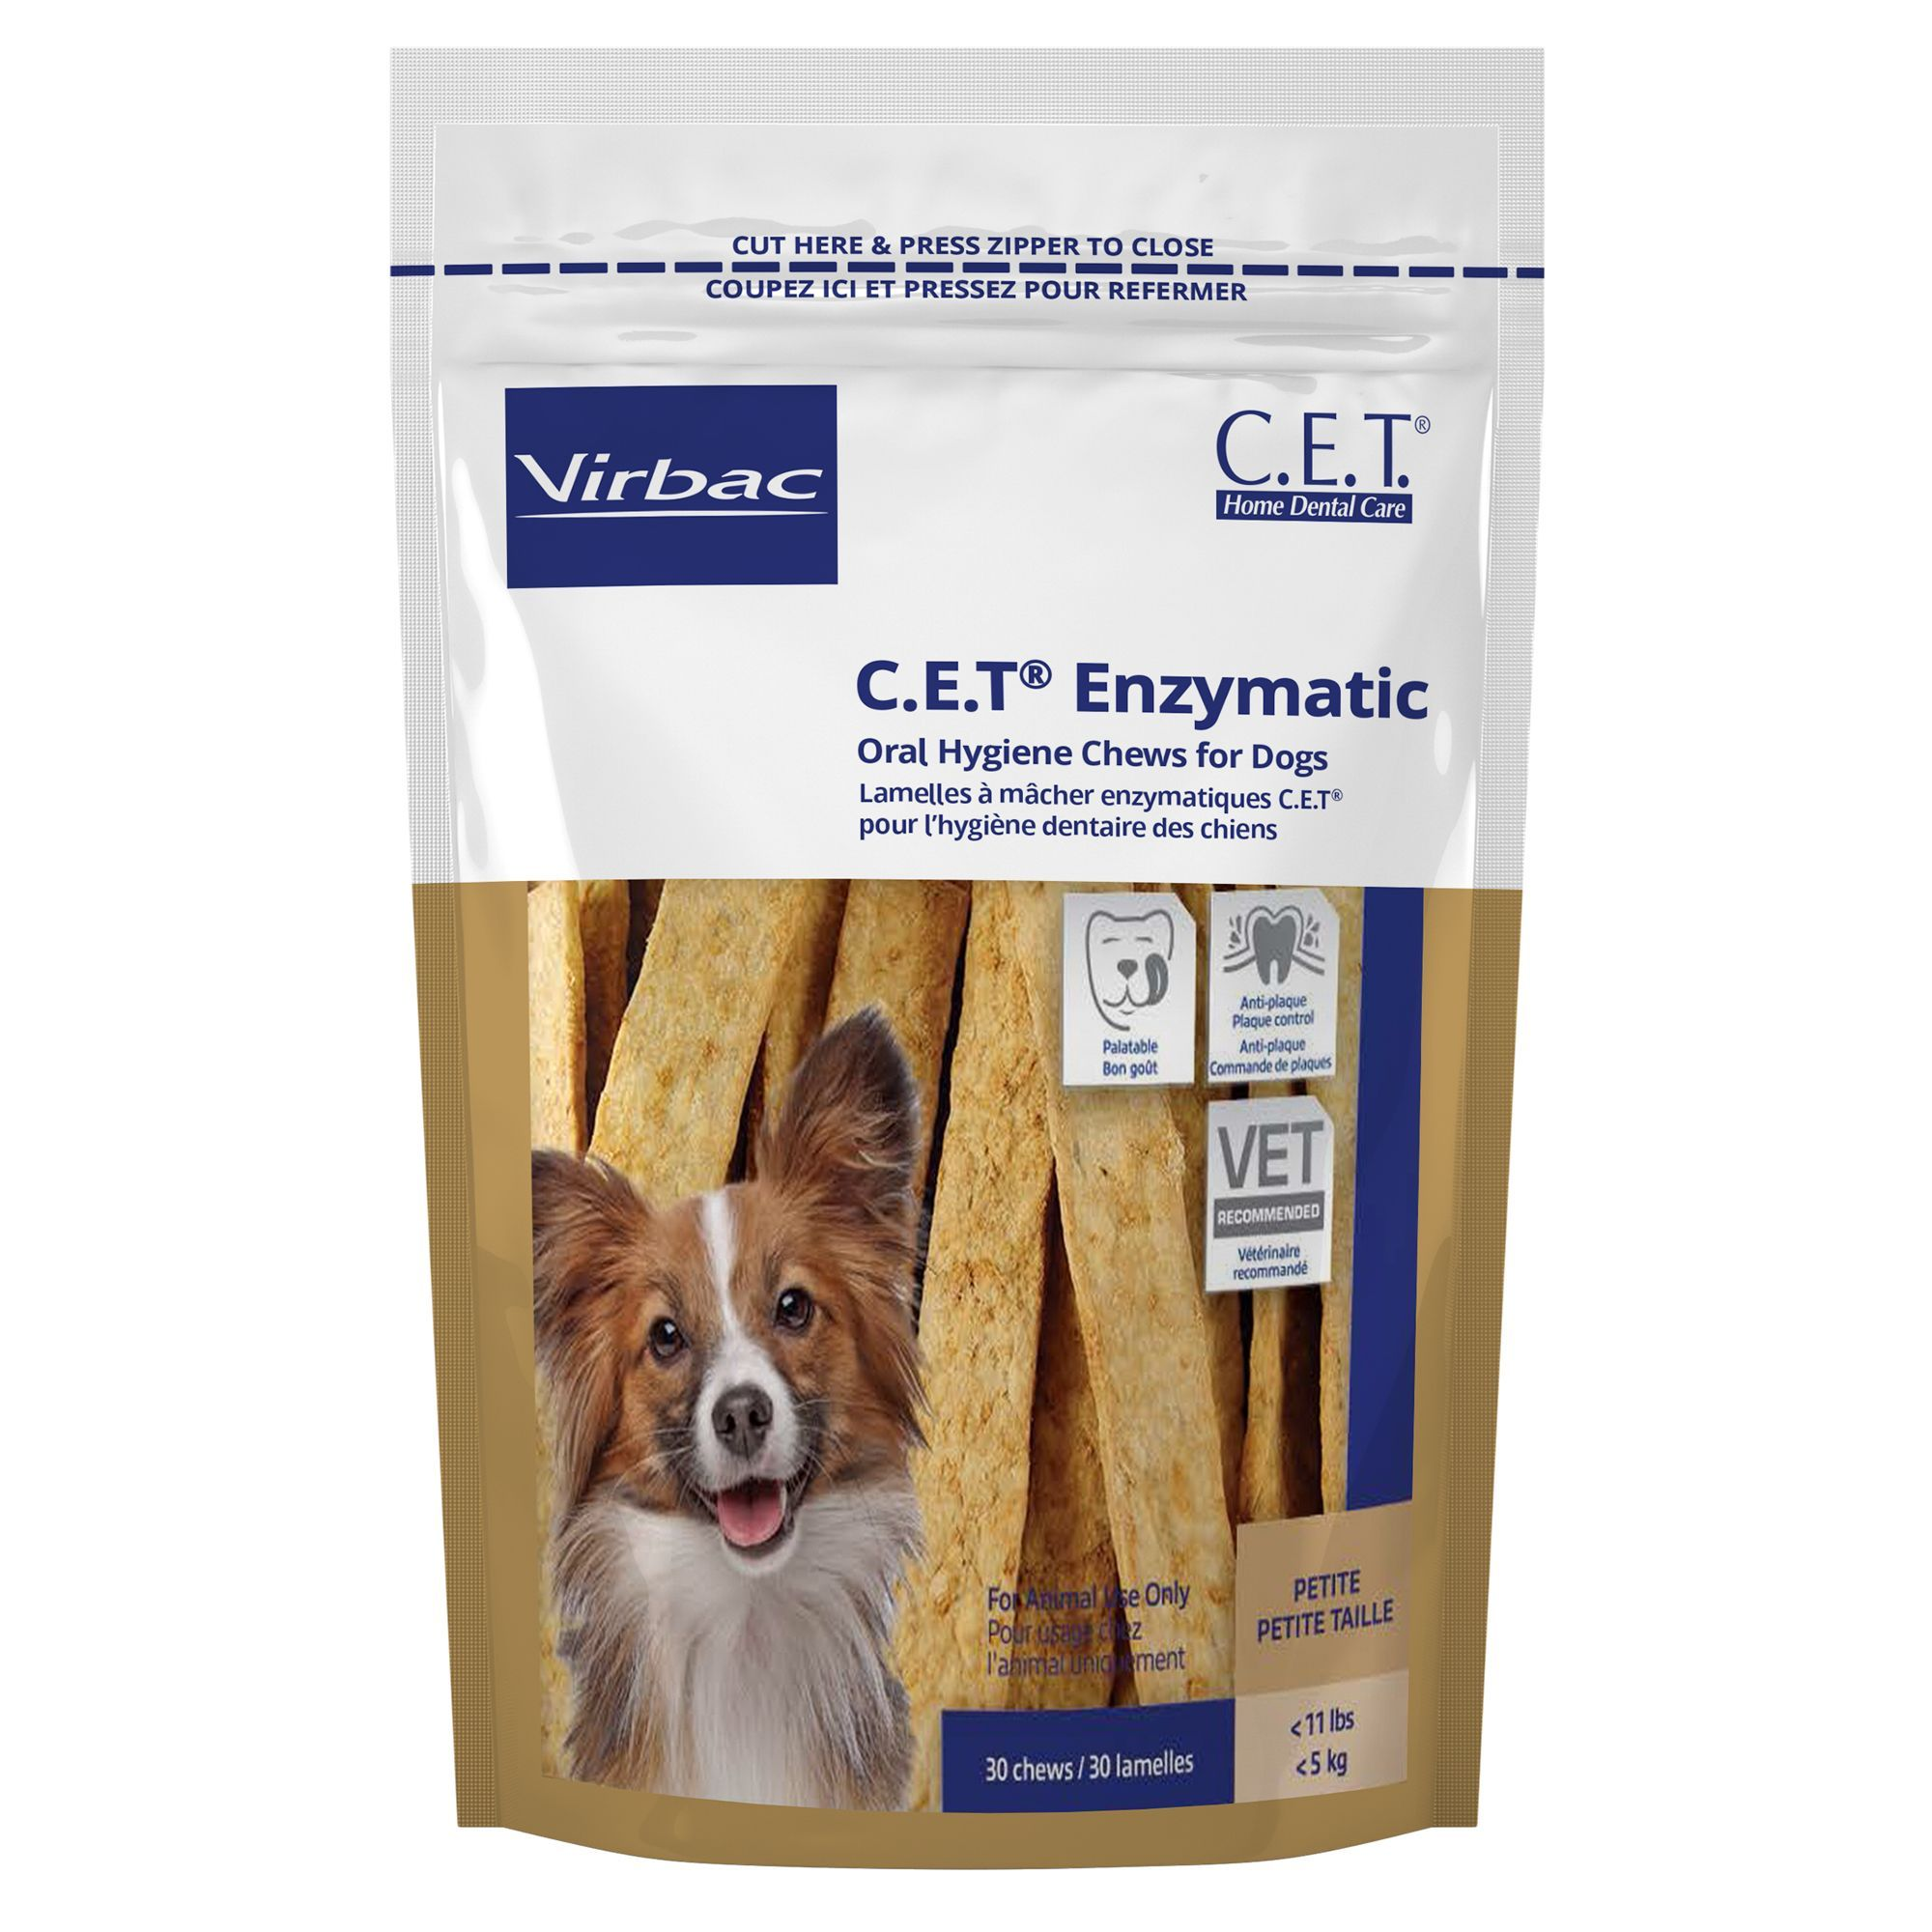 Virbac C E T Enzymatic Oral Hygiene Care Dog Chews Size Petite